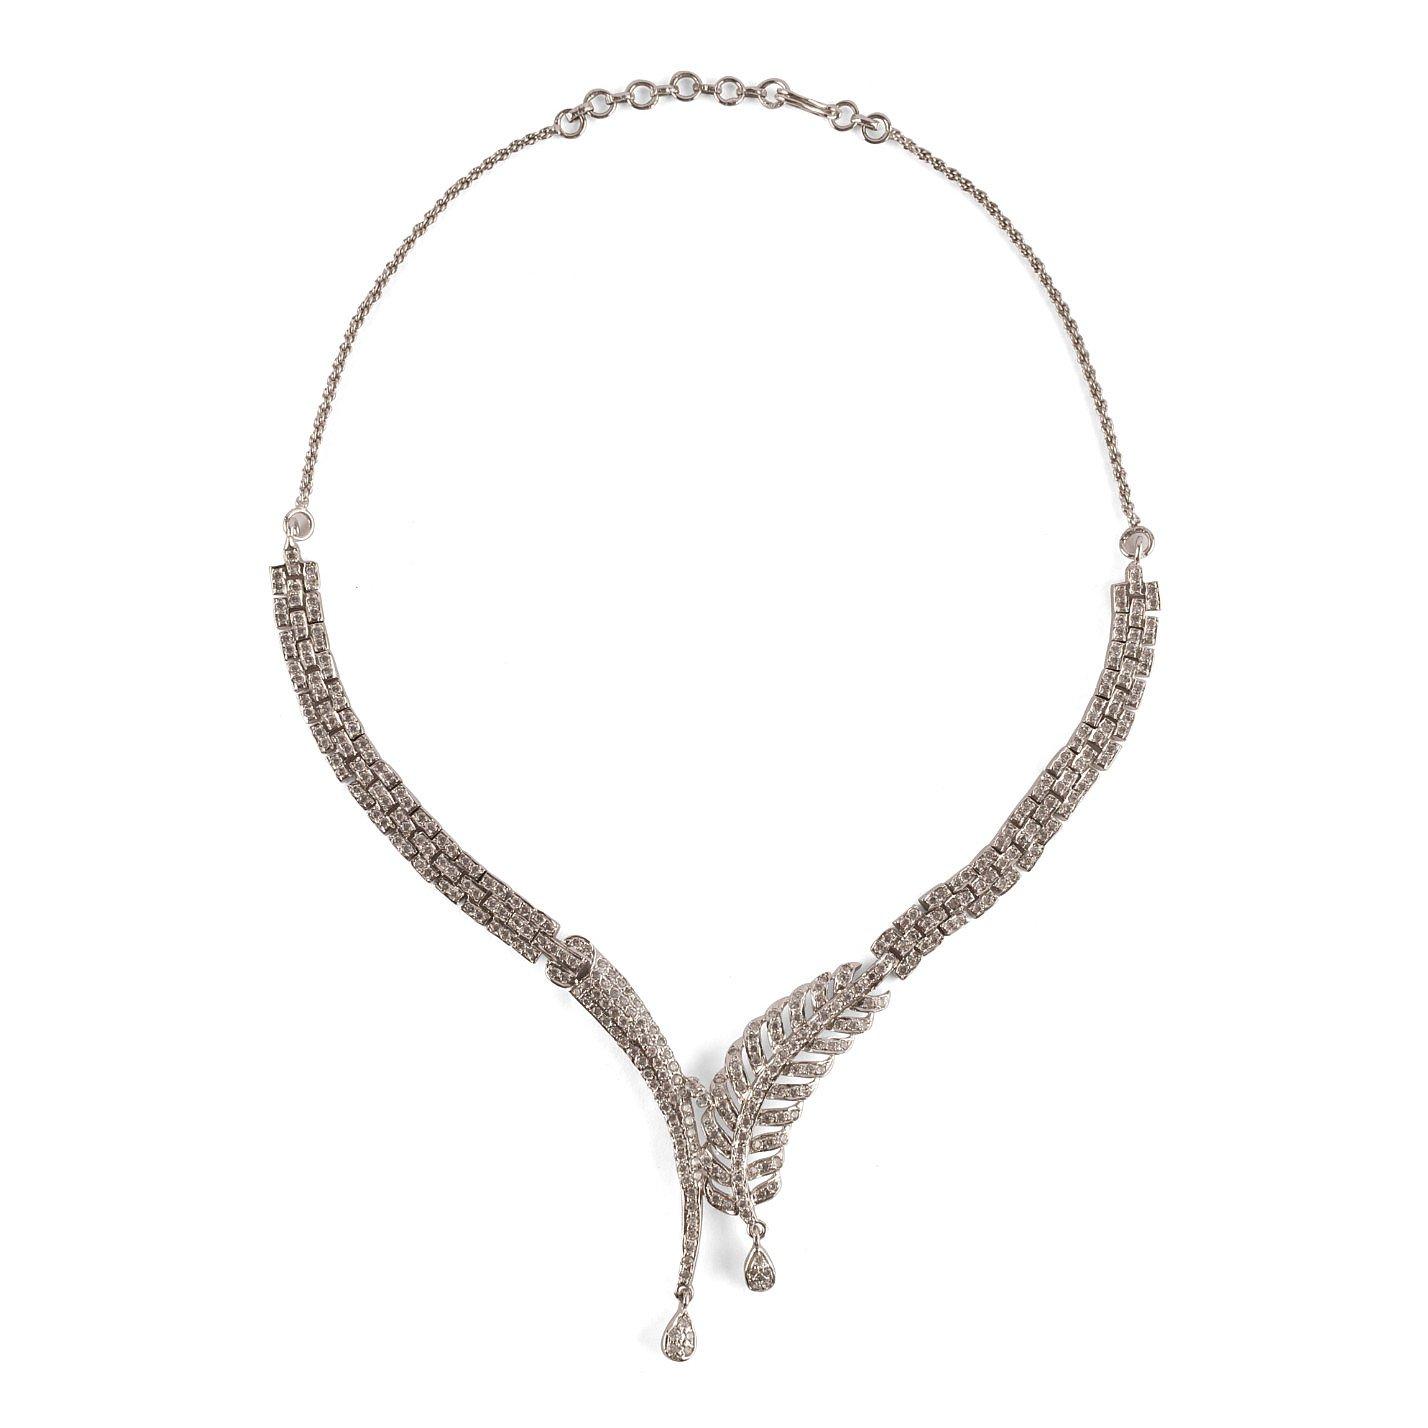 Vintage Bespoke Diamante Evening Necklace